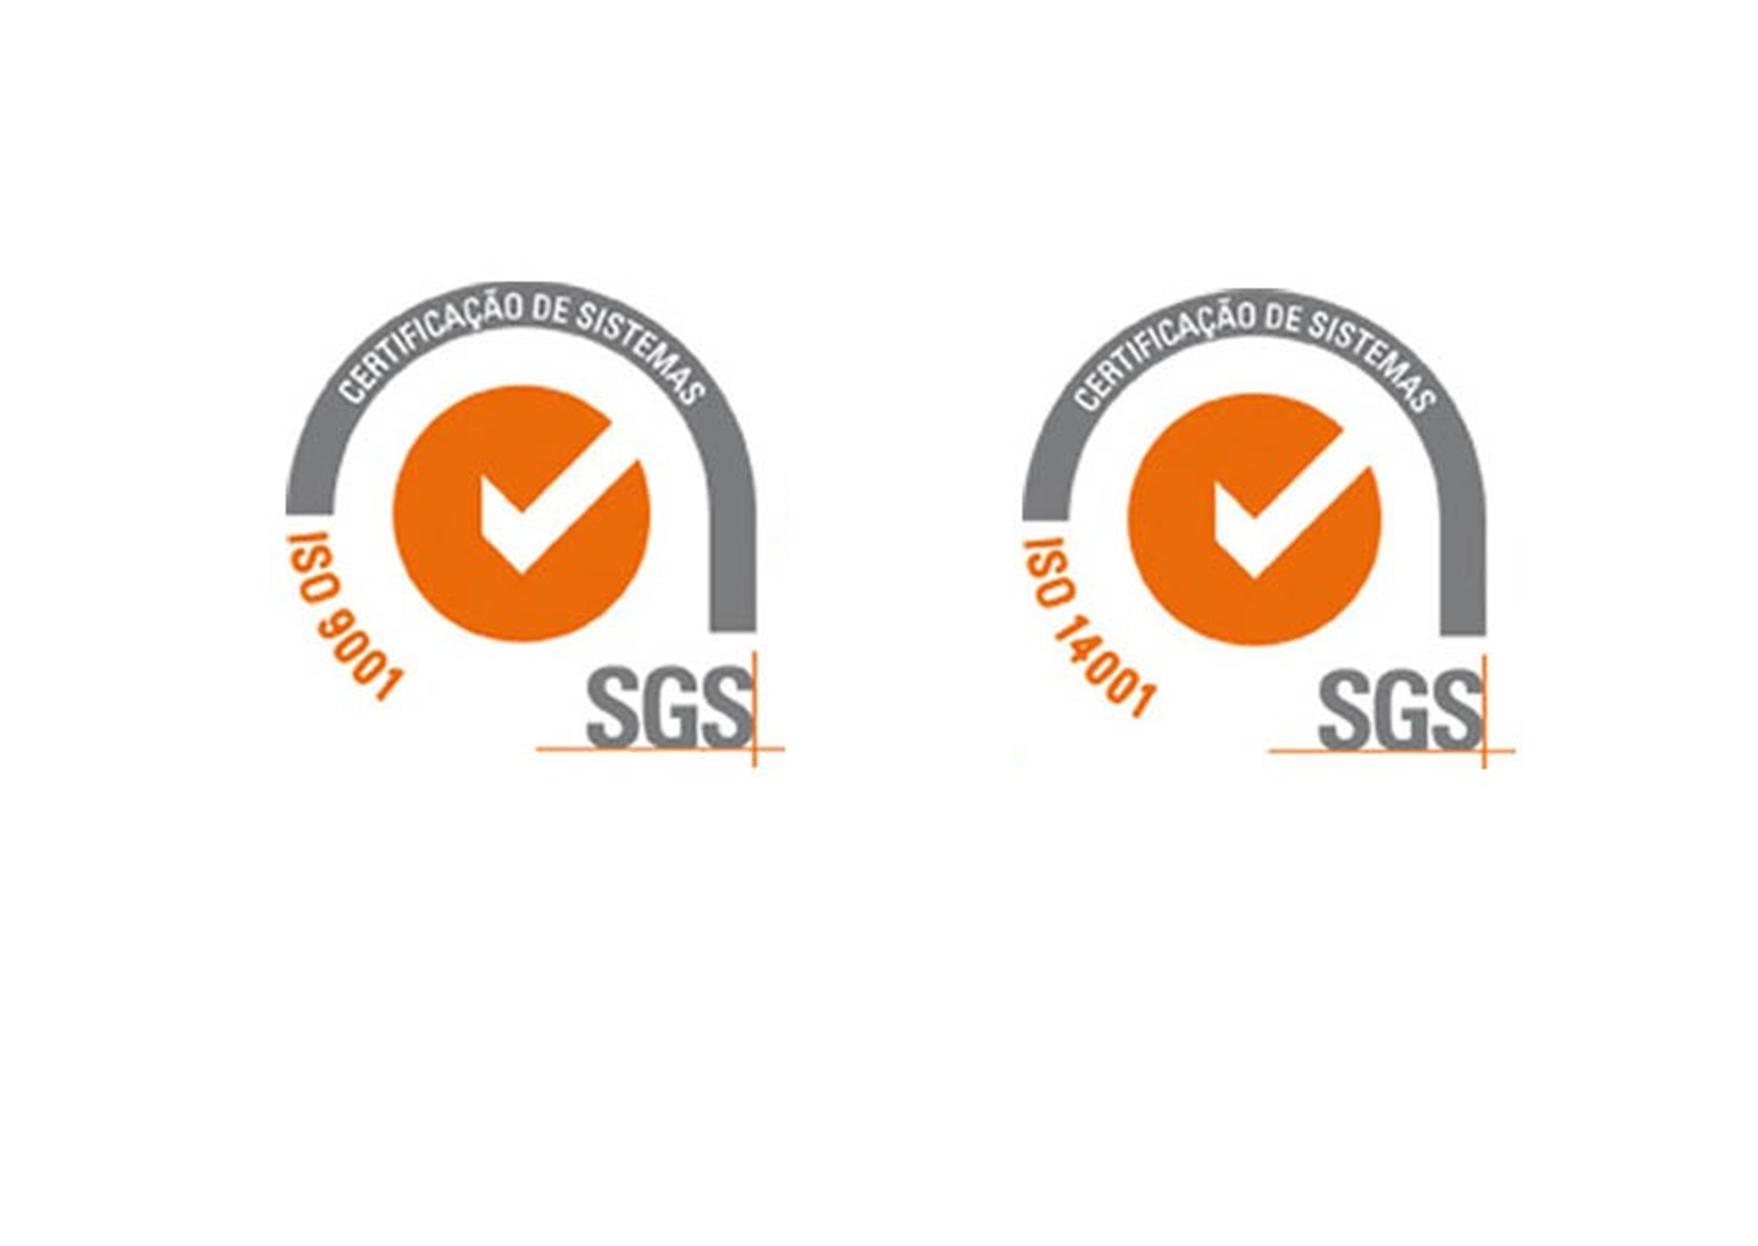 https://www.scmp.pt/assets/misc/img/noticias/2016.12.13%20CRN%20ISO/Logos%20ISO%209001%20e%2014001.jpg.png